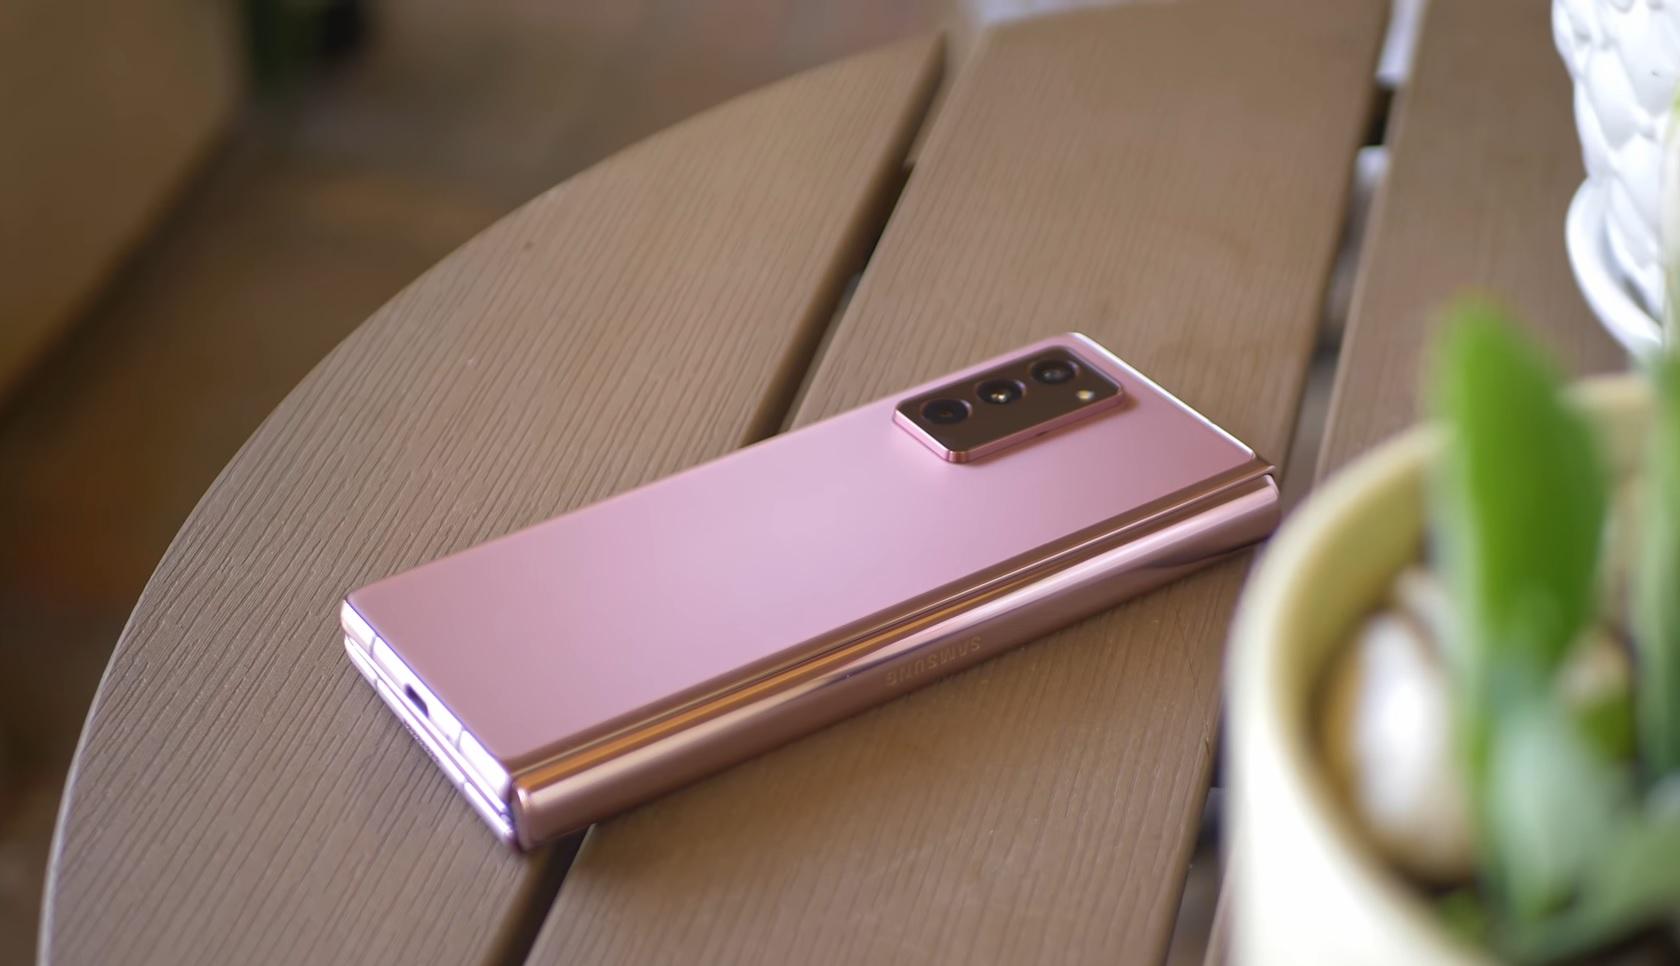 Samsung Galaxy Z Fold 2 On Desk